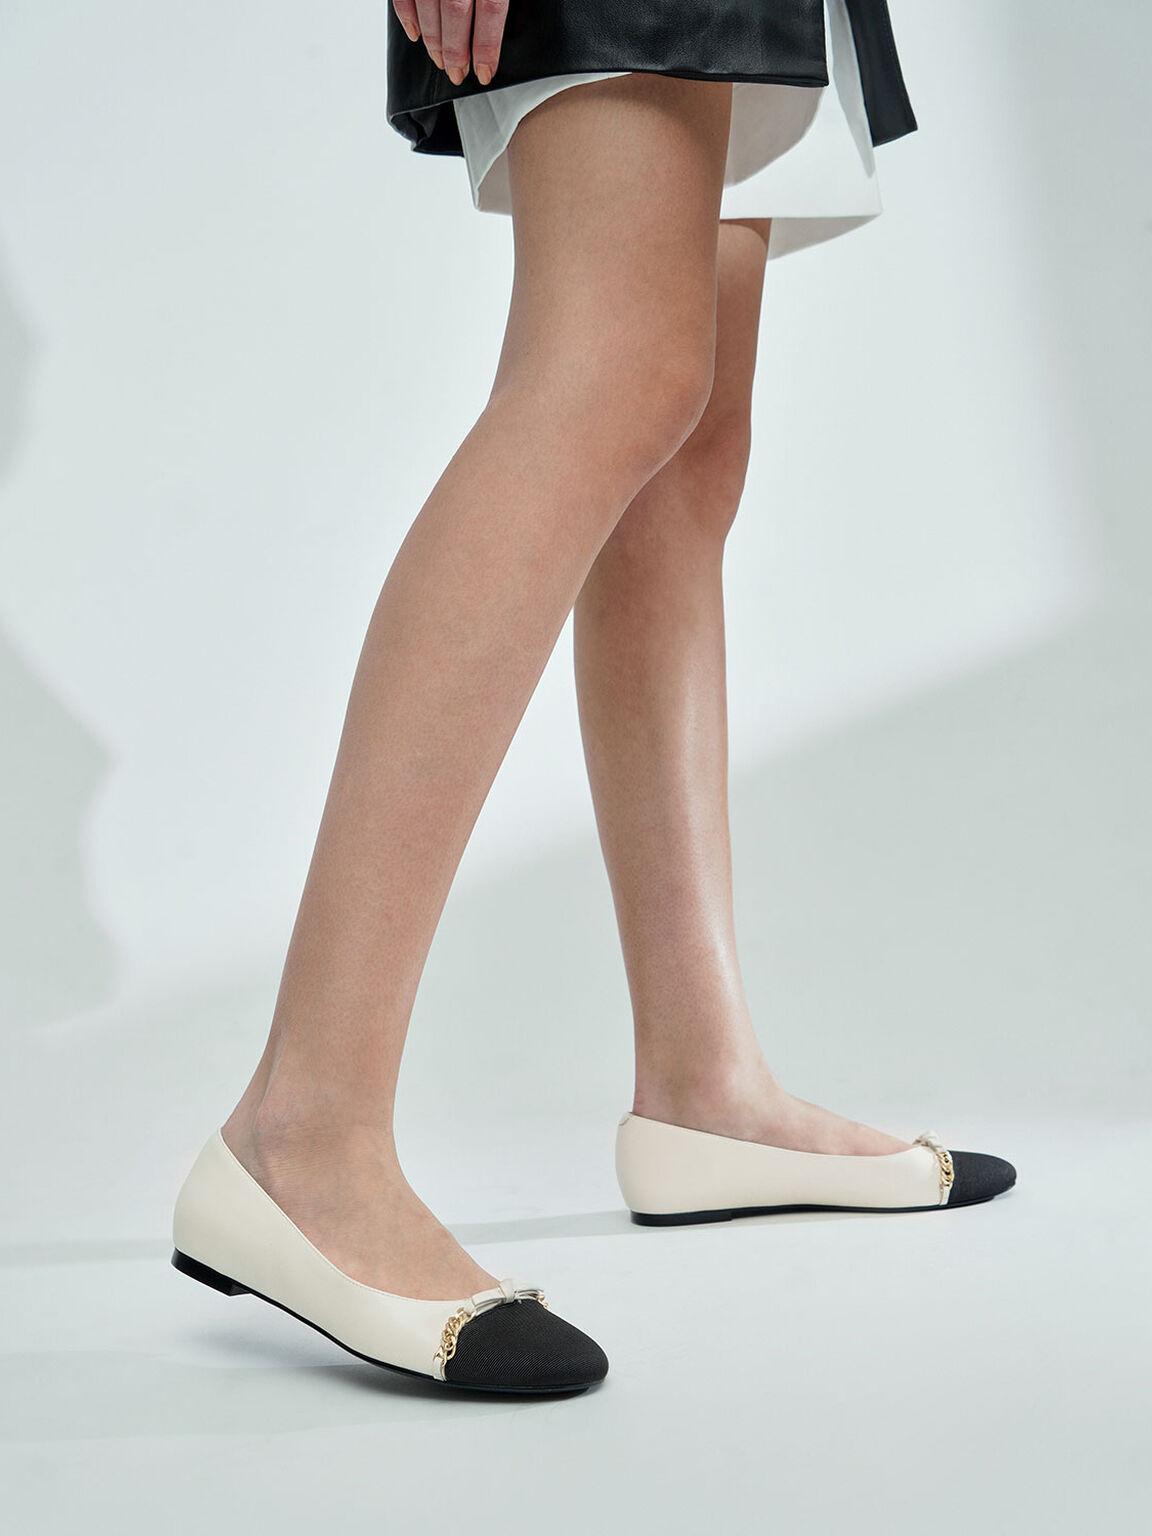 Grosgrain Chain-Link Ballerina Flats, Cream, hi-res